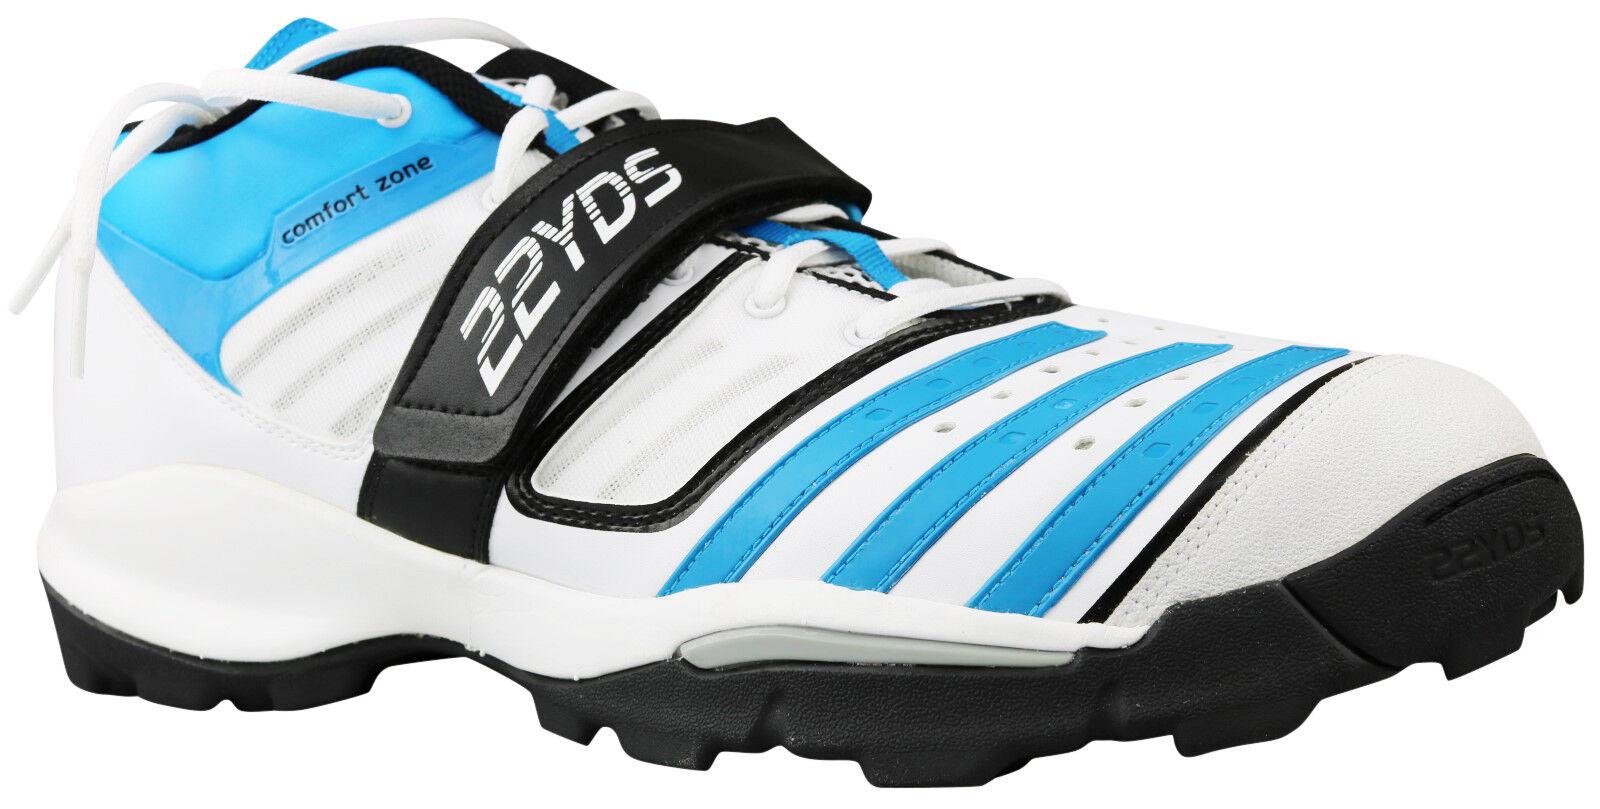 Adidas Twenty2yds Mid IV Herren Cricket Schuhe Stiefel D67043 Gr. 50 5 NEU & OVP